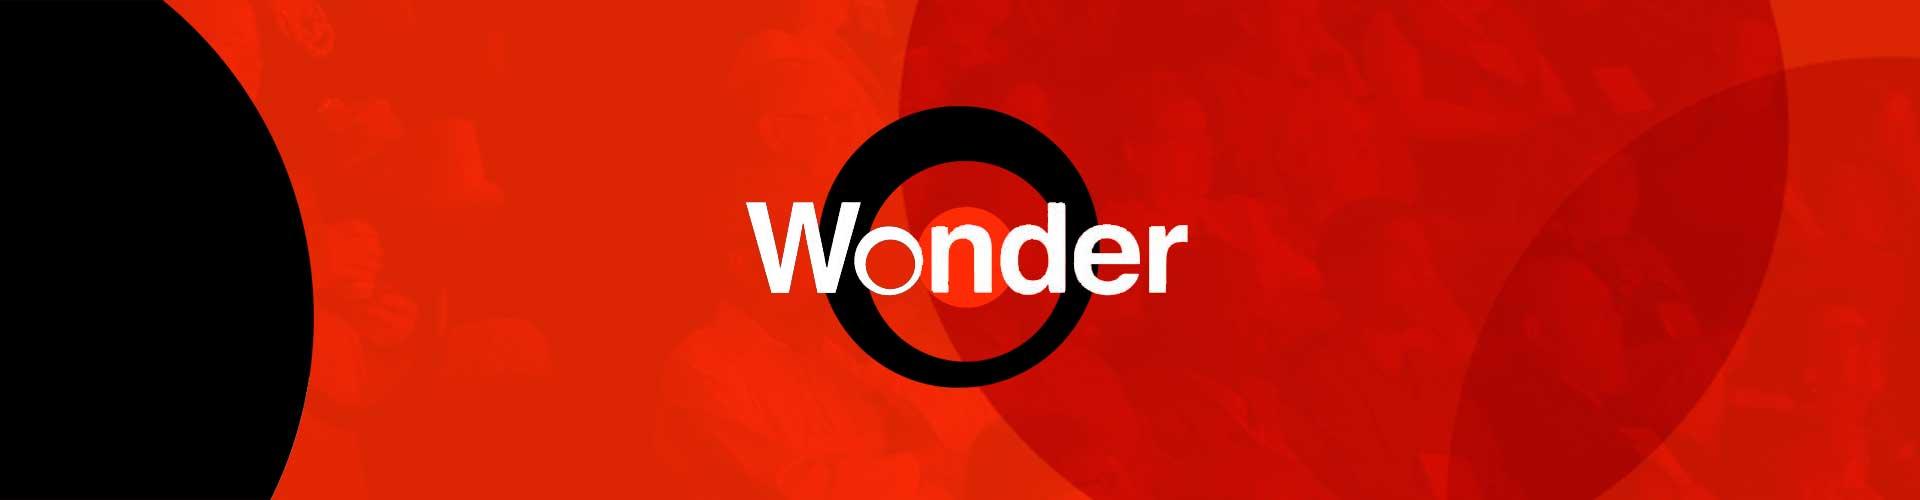 TEDxGreensboro 2018 Wonder